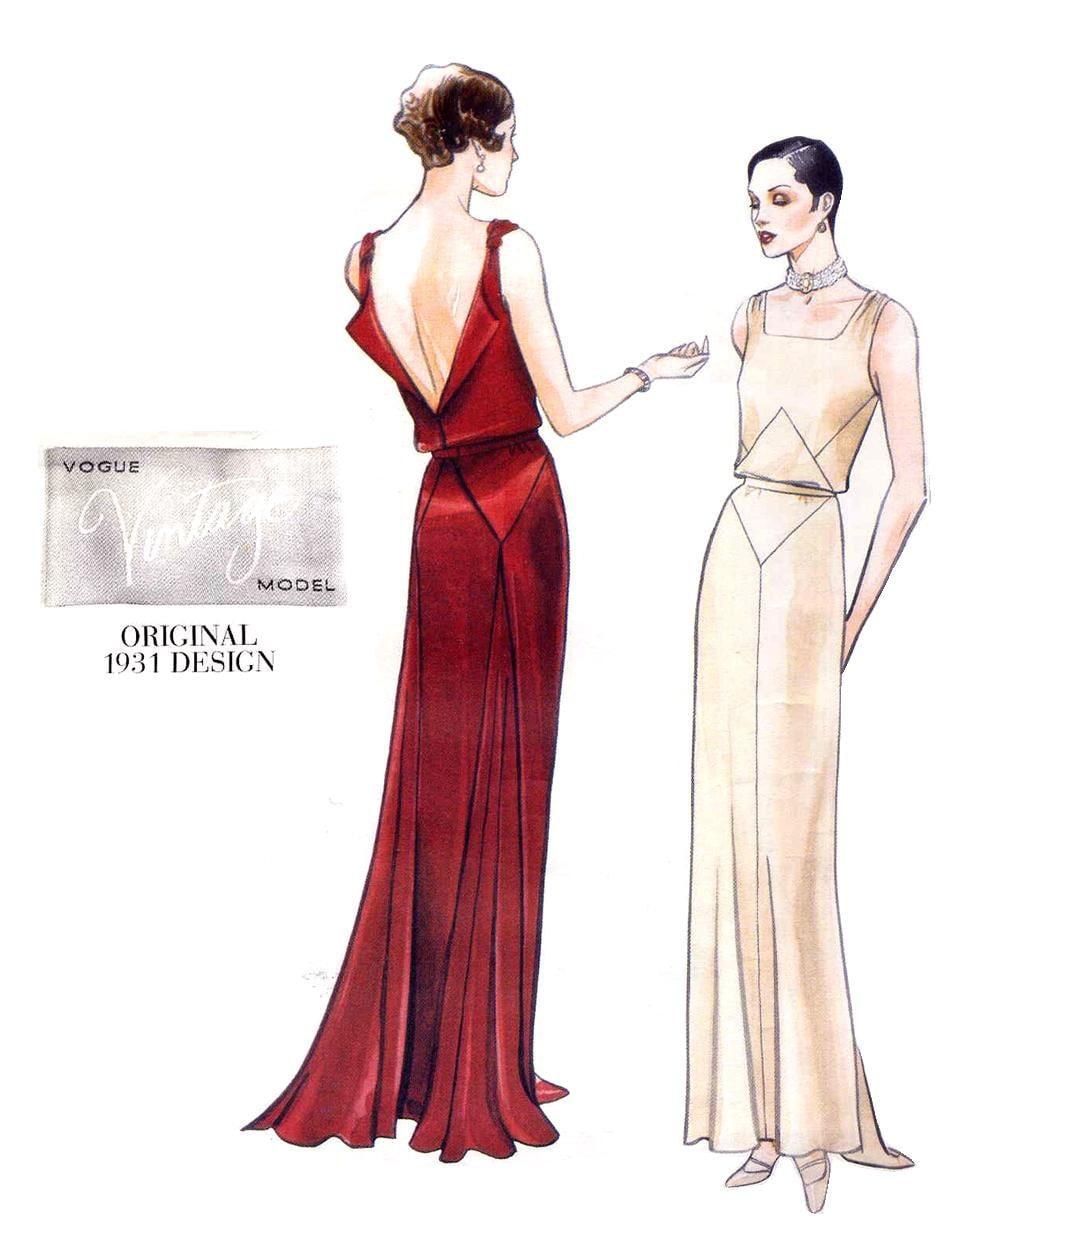 Vogue 2241 Vintage Model 1930 S Art Deco Evening Dress